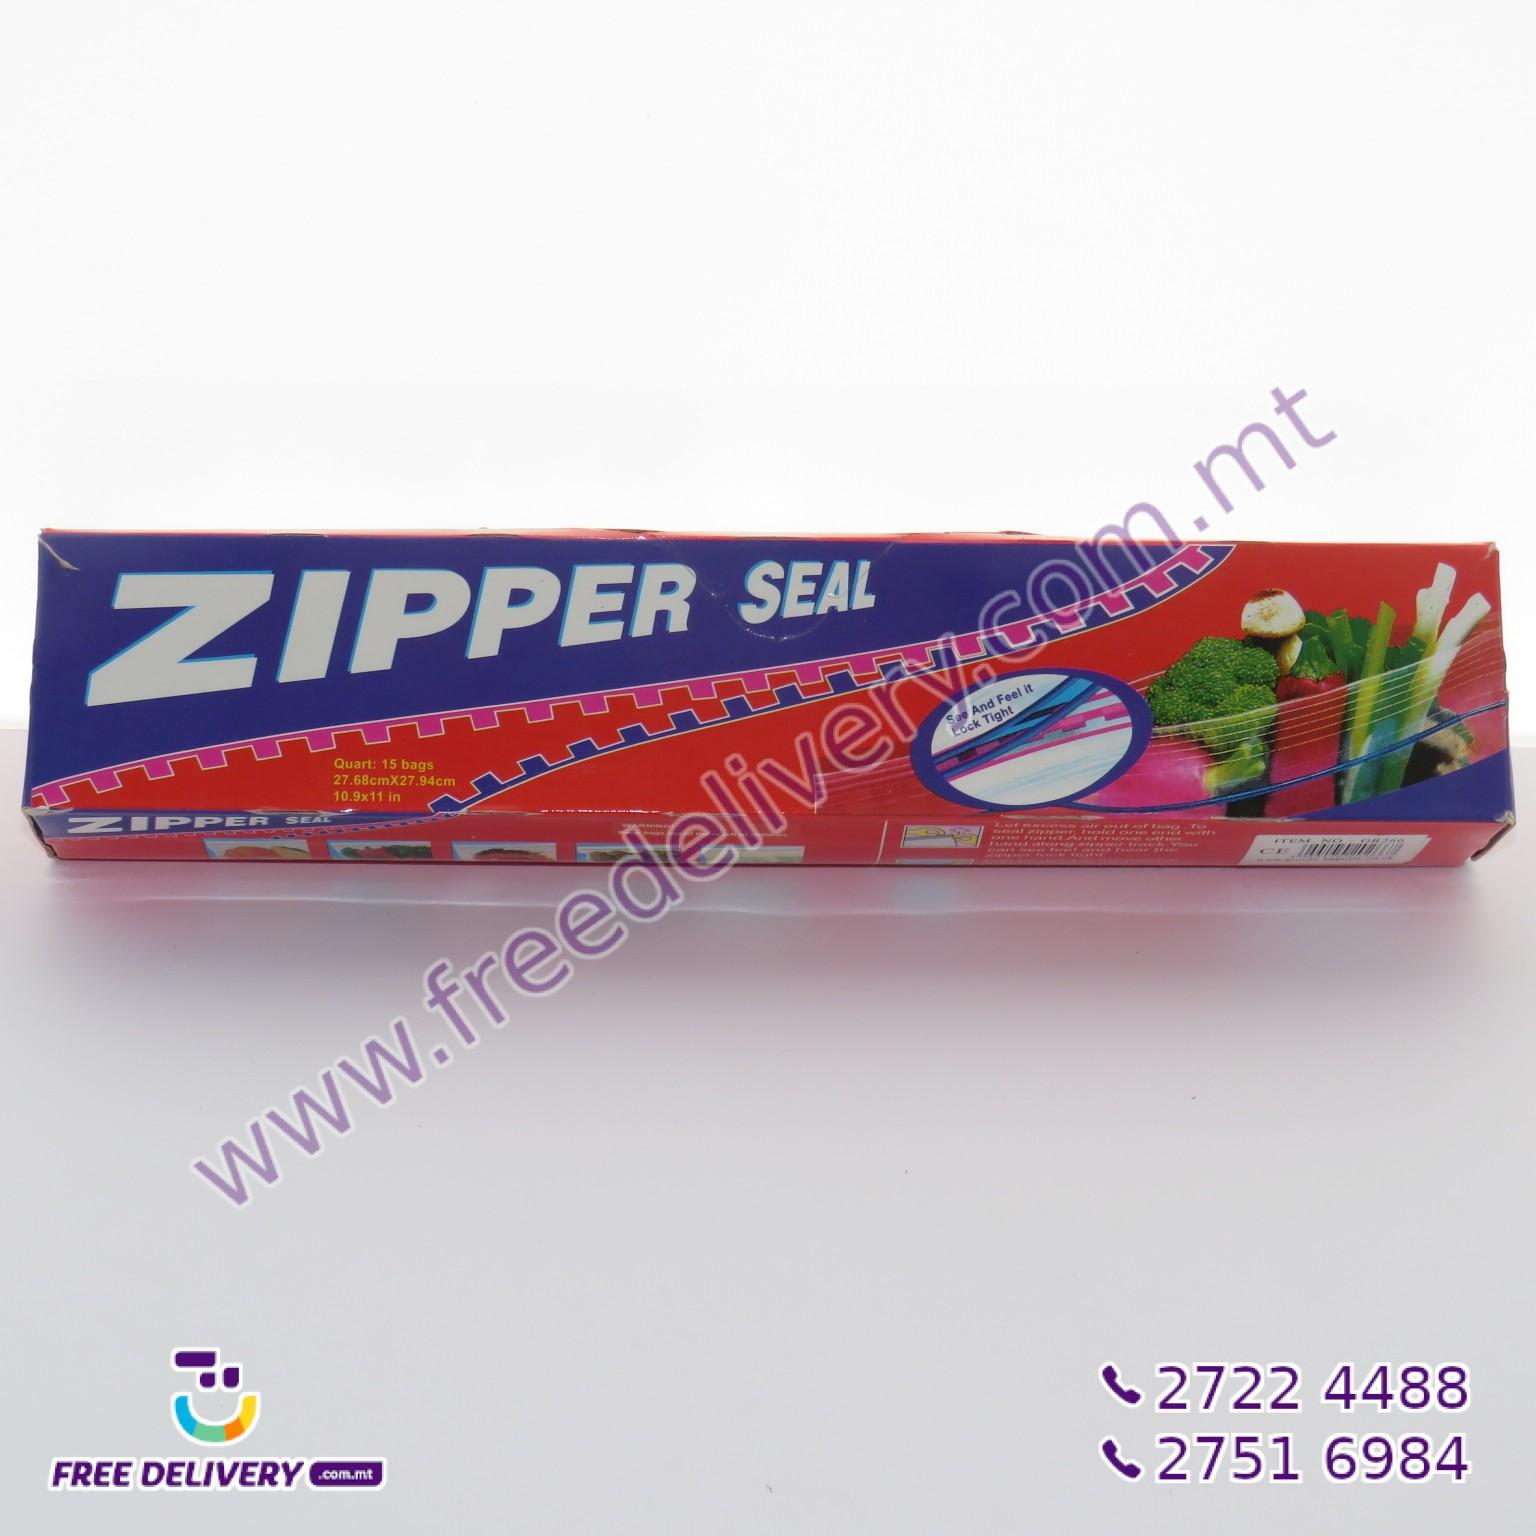 15 ZIPPER SEAL BAGS 27.7 X 28CM – MISC202667